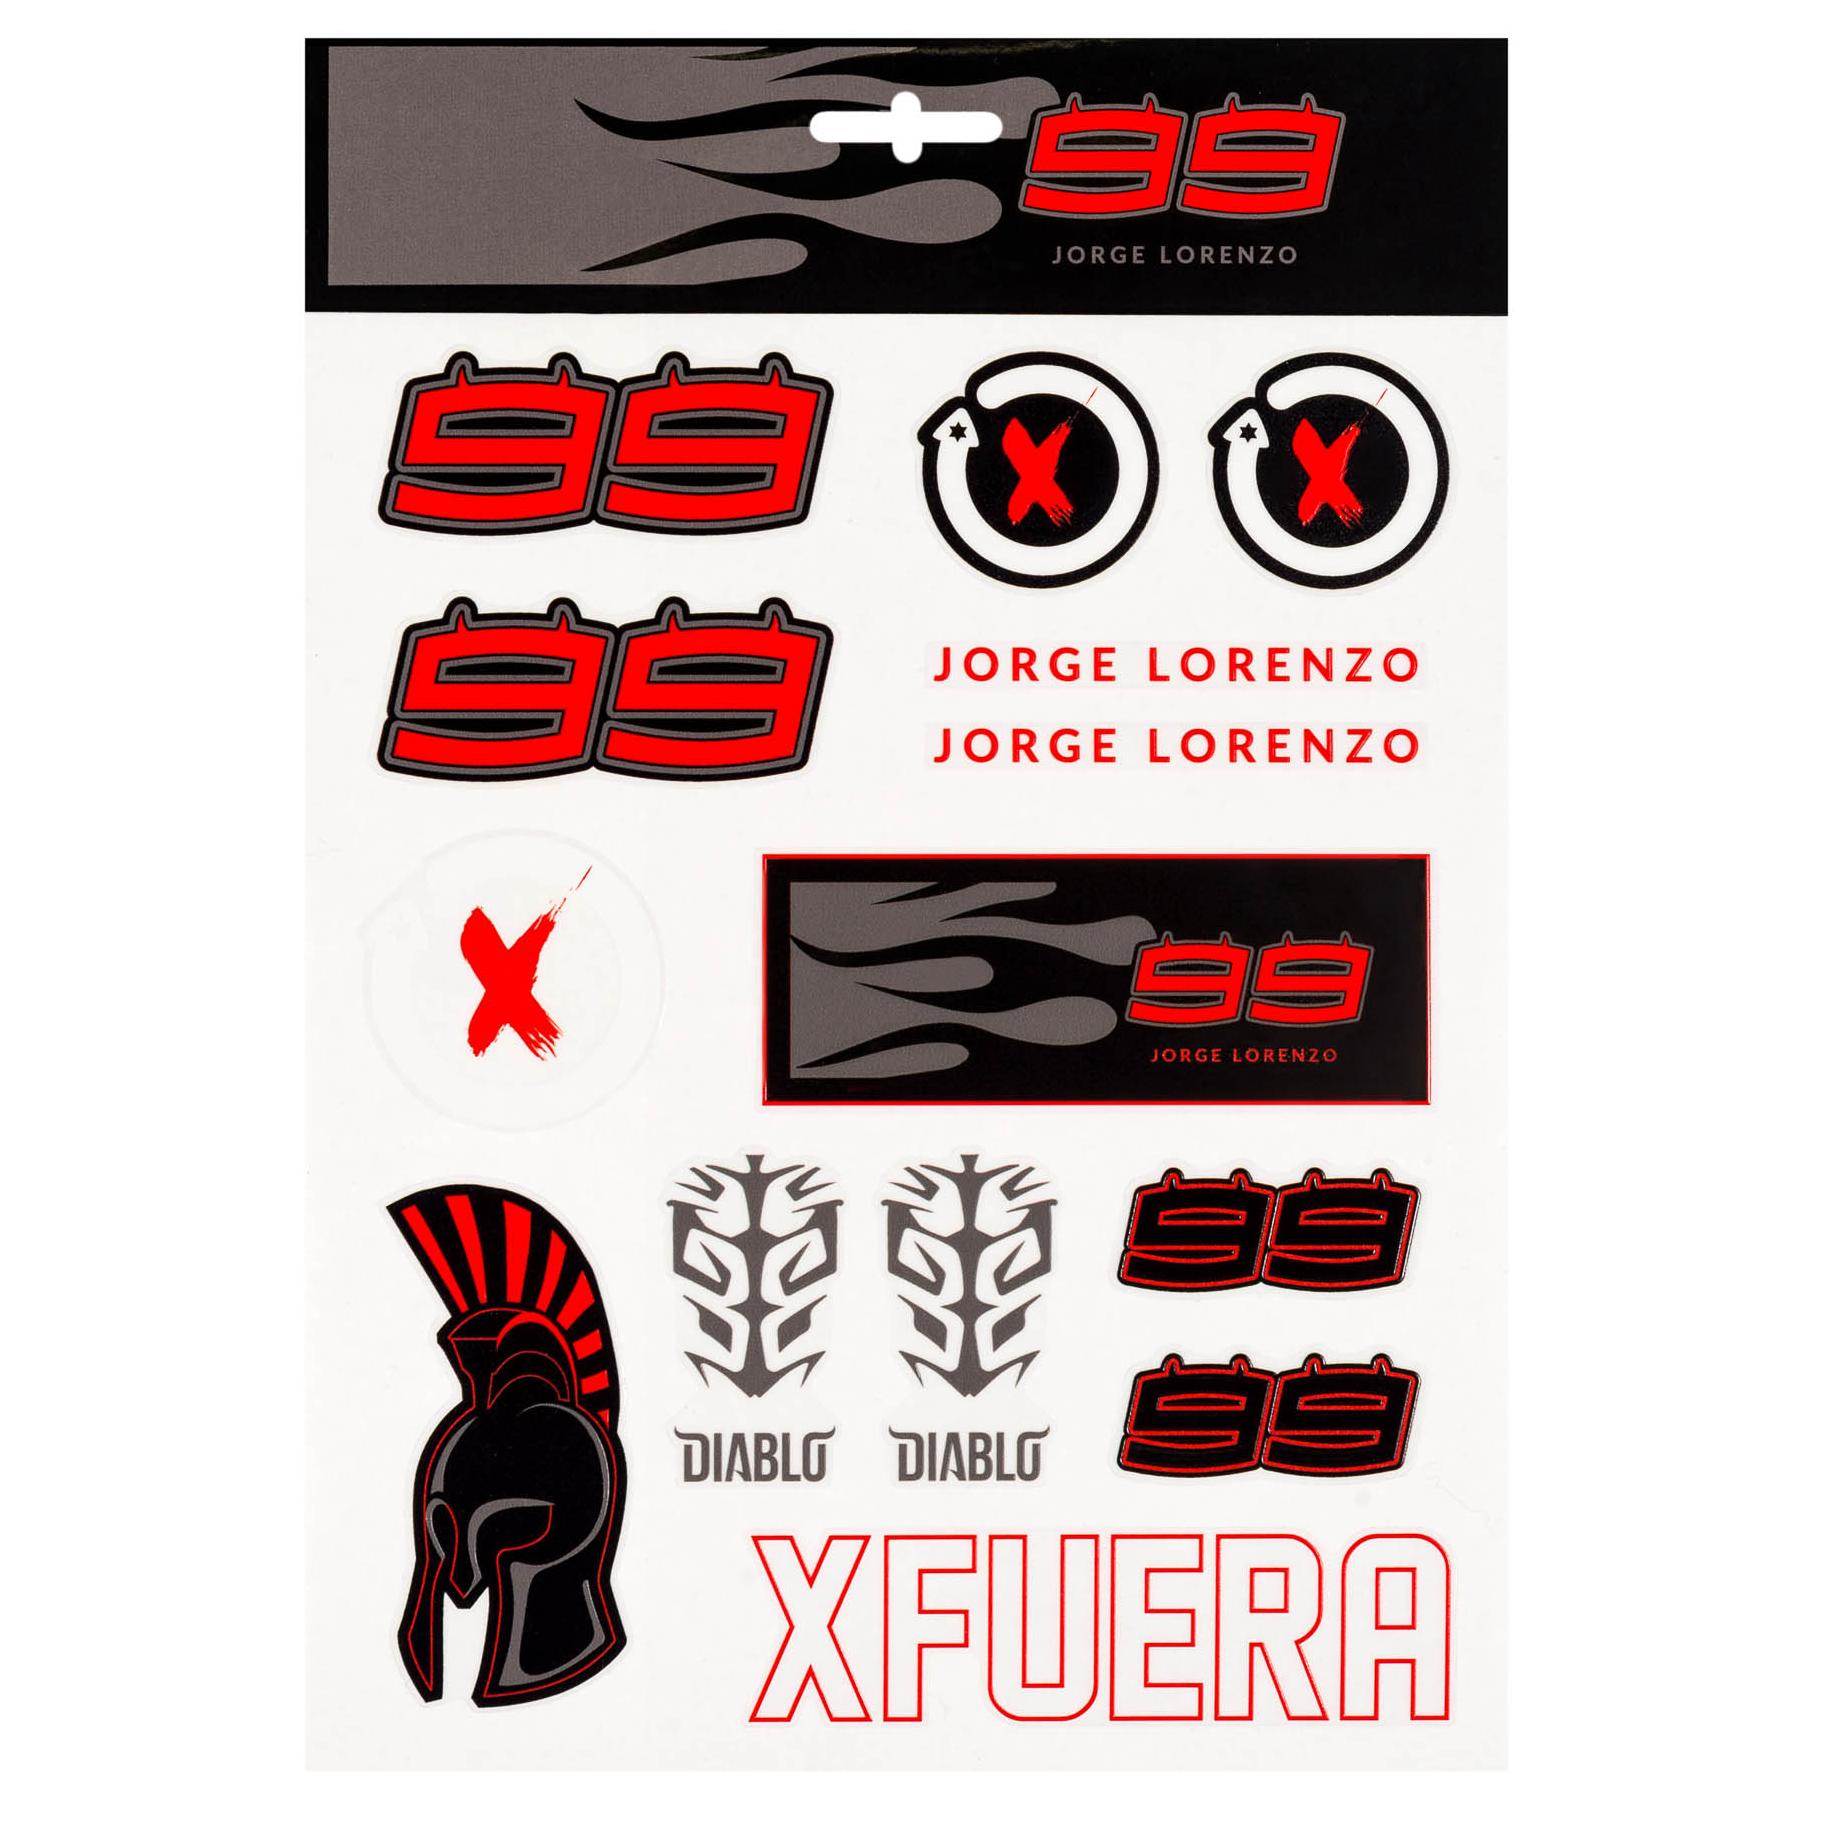 Details about 2019 jorge lorenzo 99 motogp large sticker pack decal x14 official merchandise